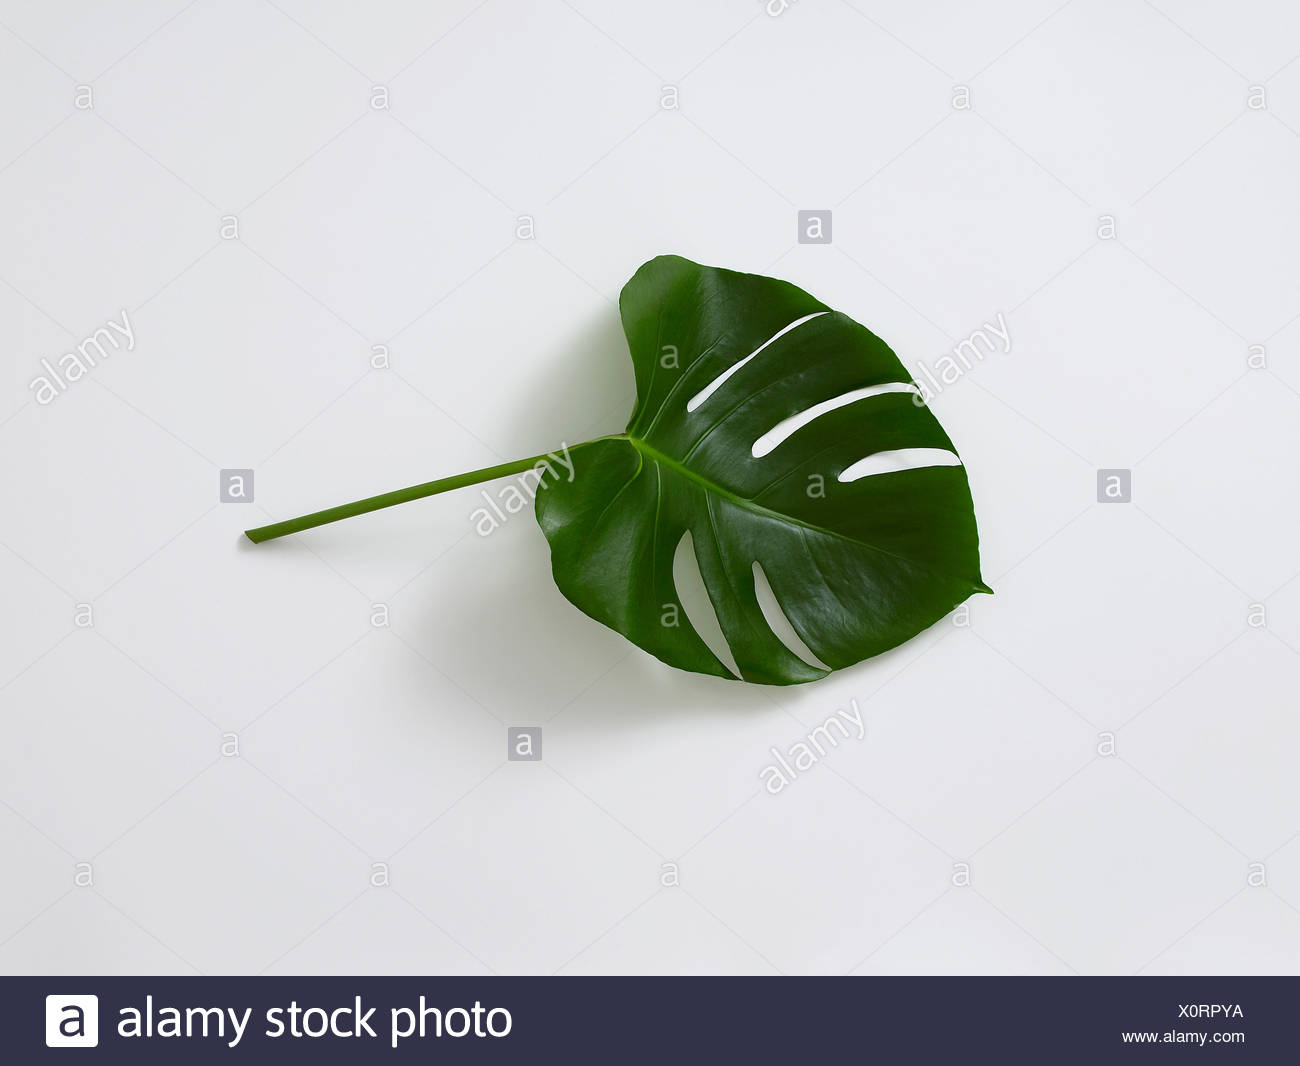 Monstera leaf on white background, close-up - Stock Image